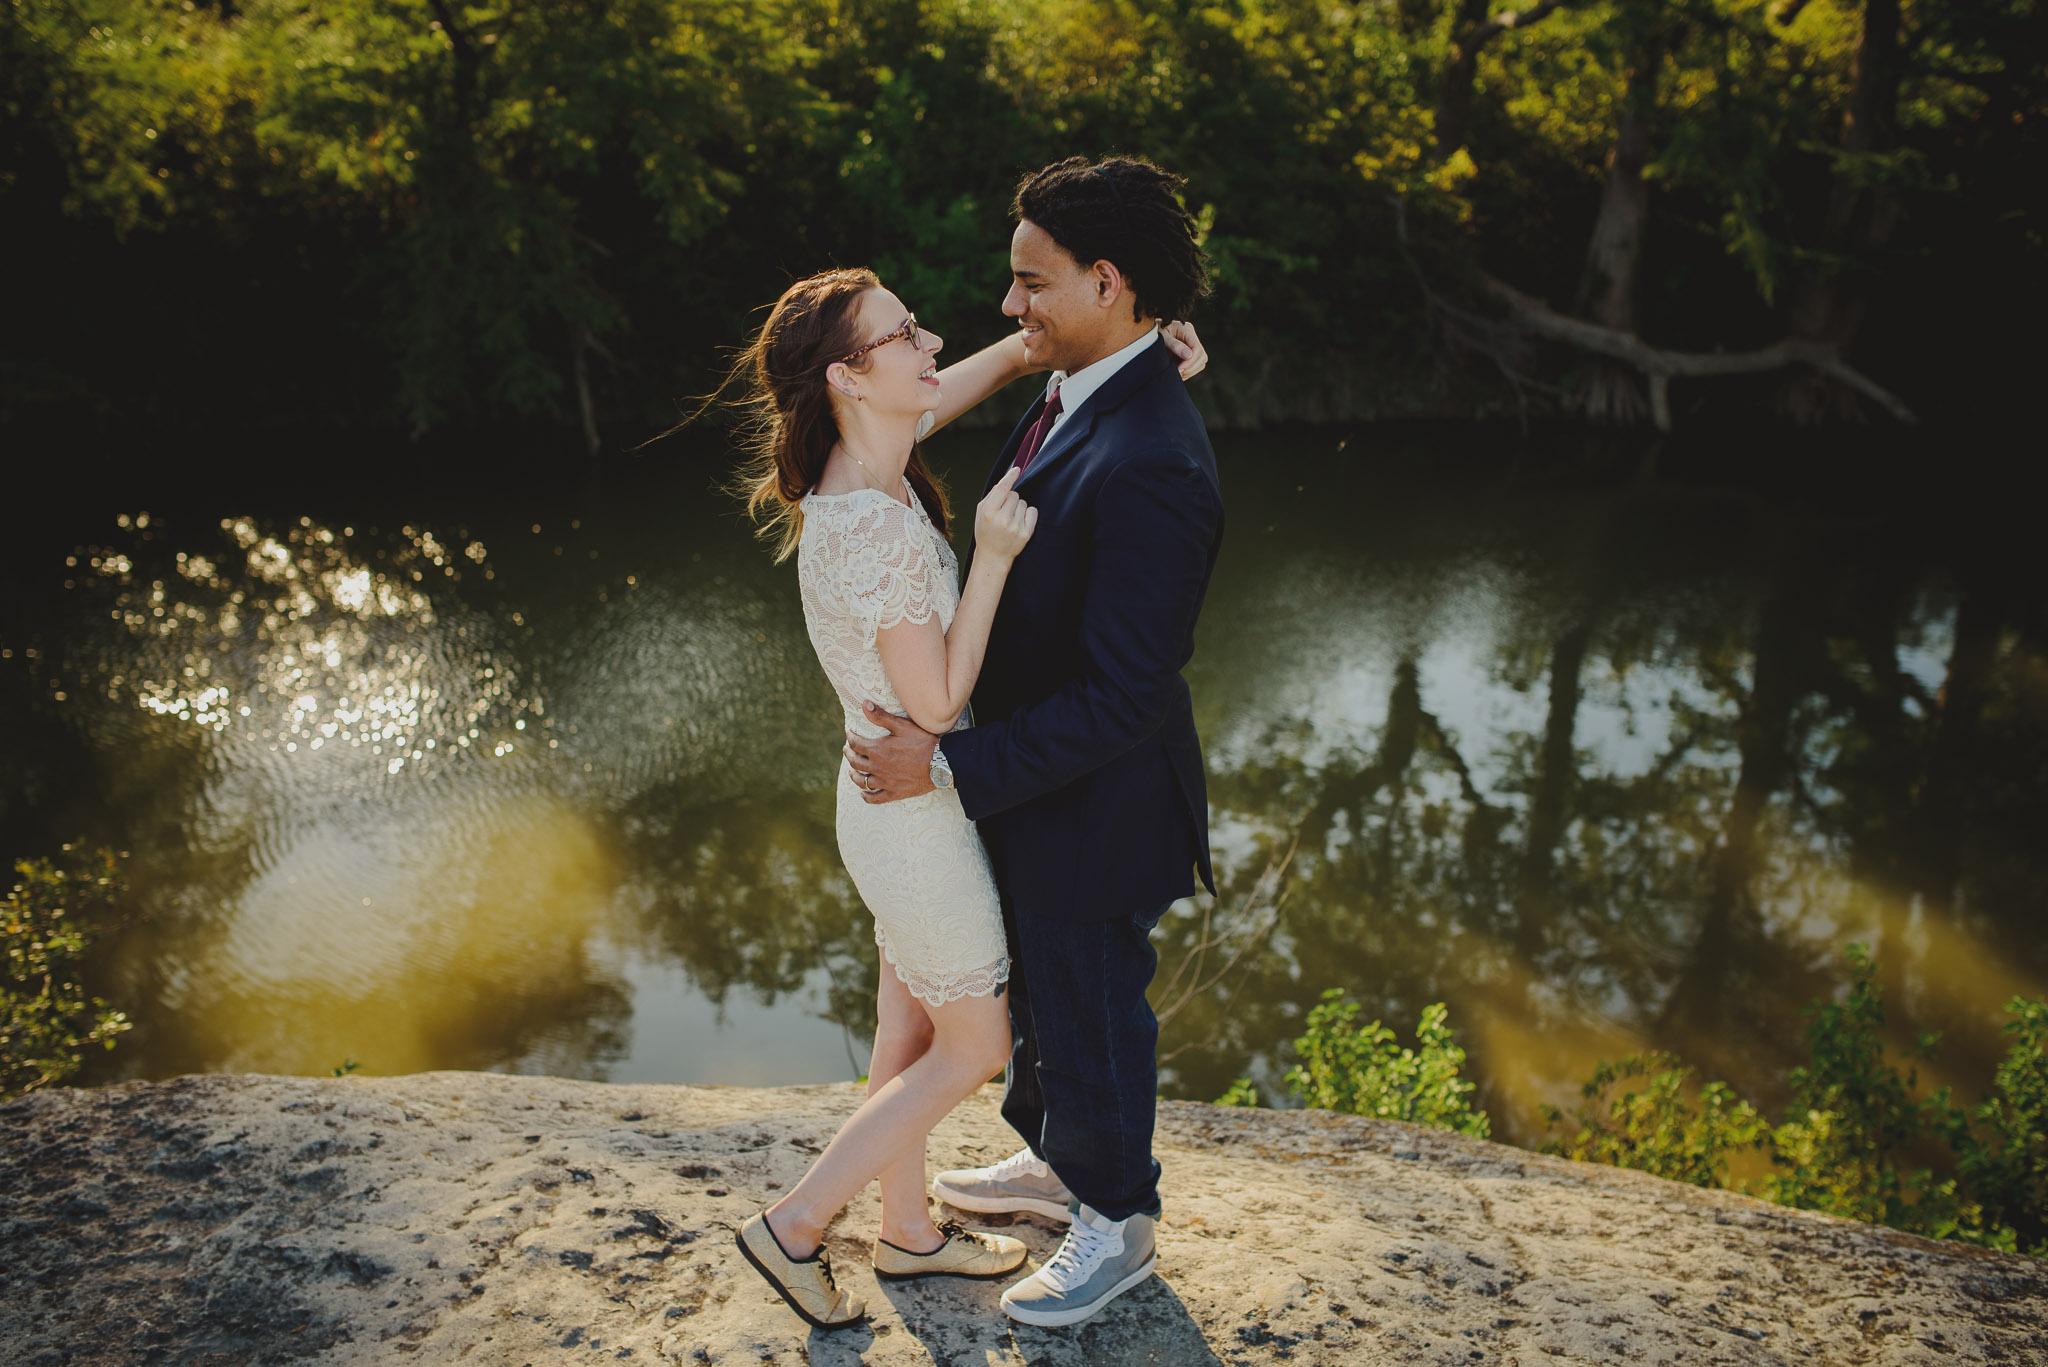 Austin-texas-wedding-photographer-McKinney-Falls-State-Park-0002.jpg